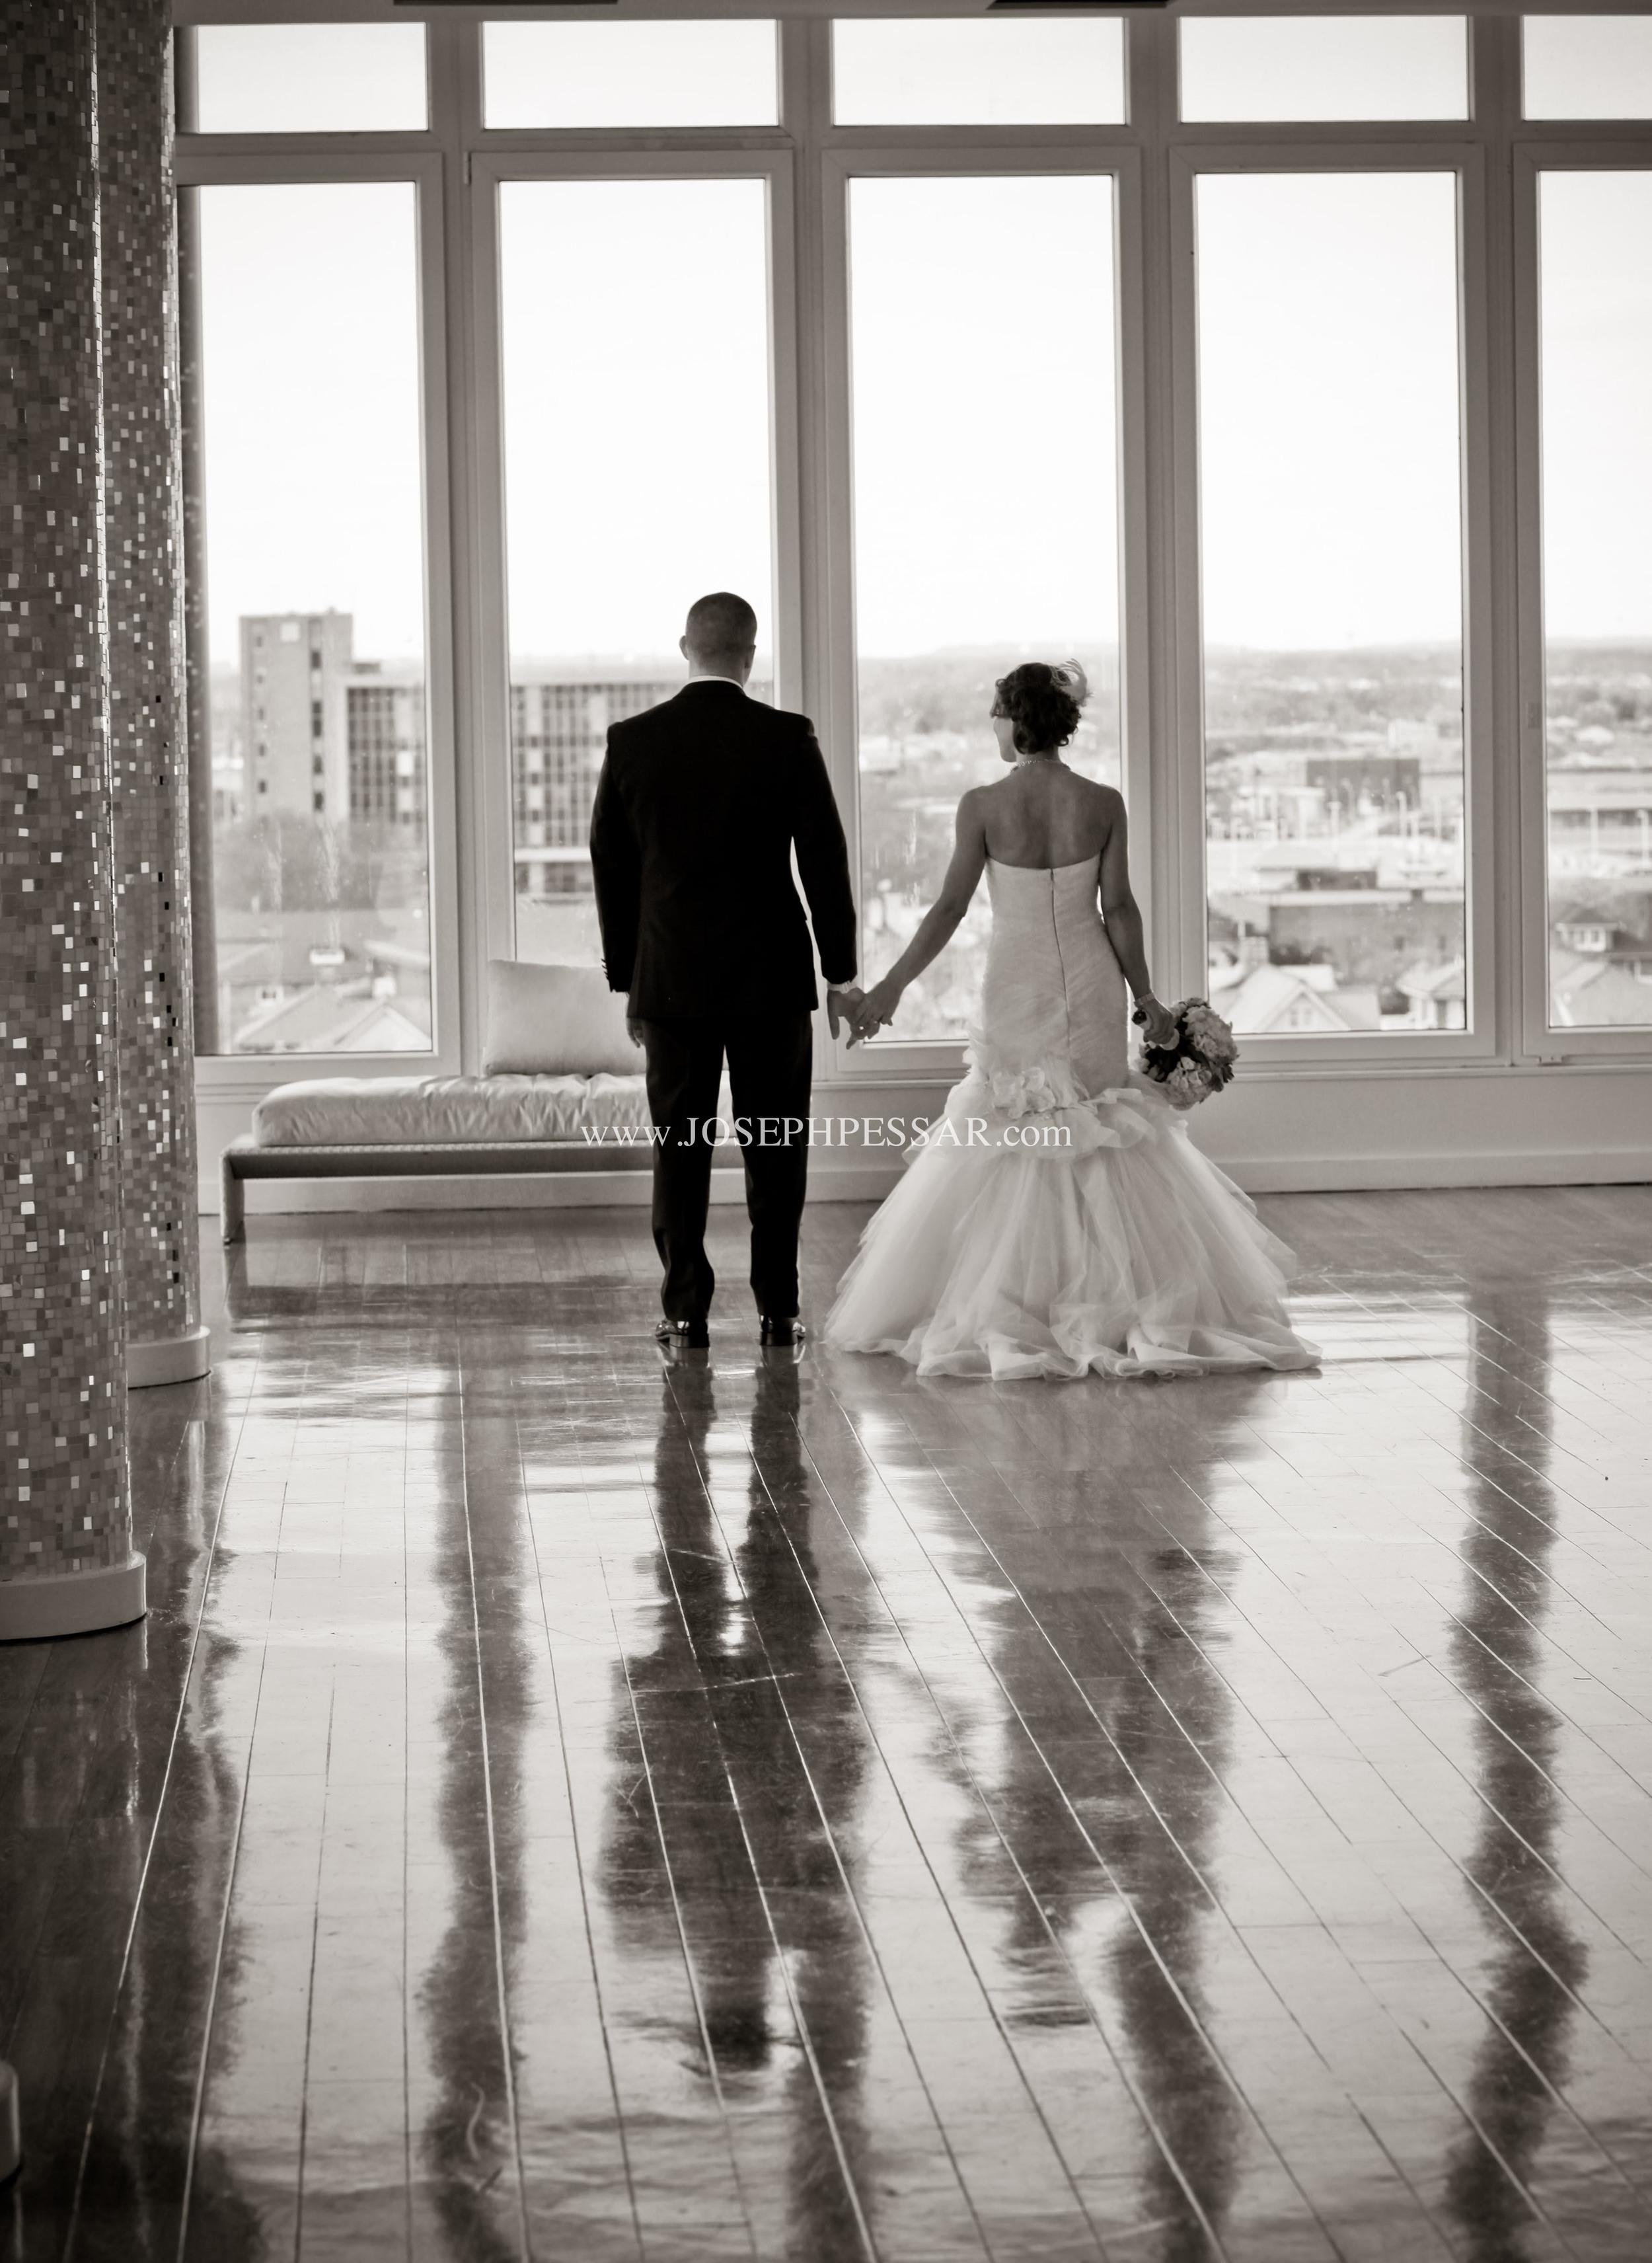 nyc_wedding_photographer0019.jpg